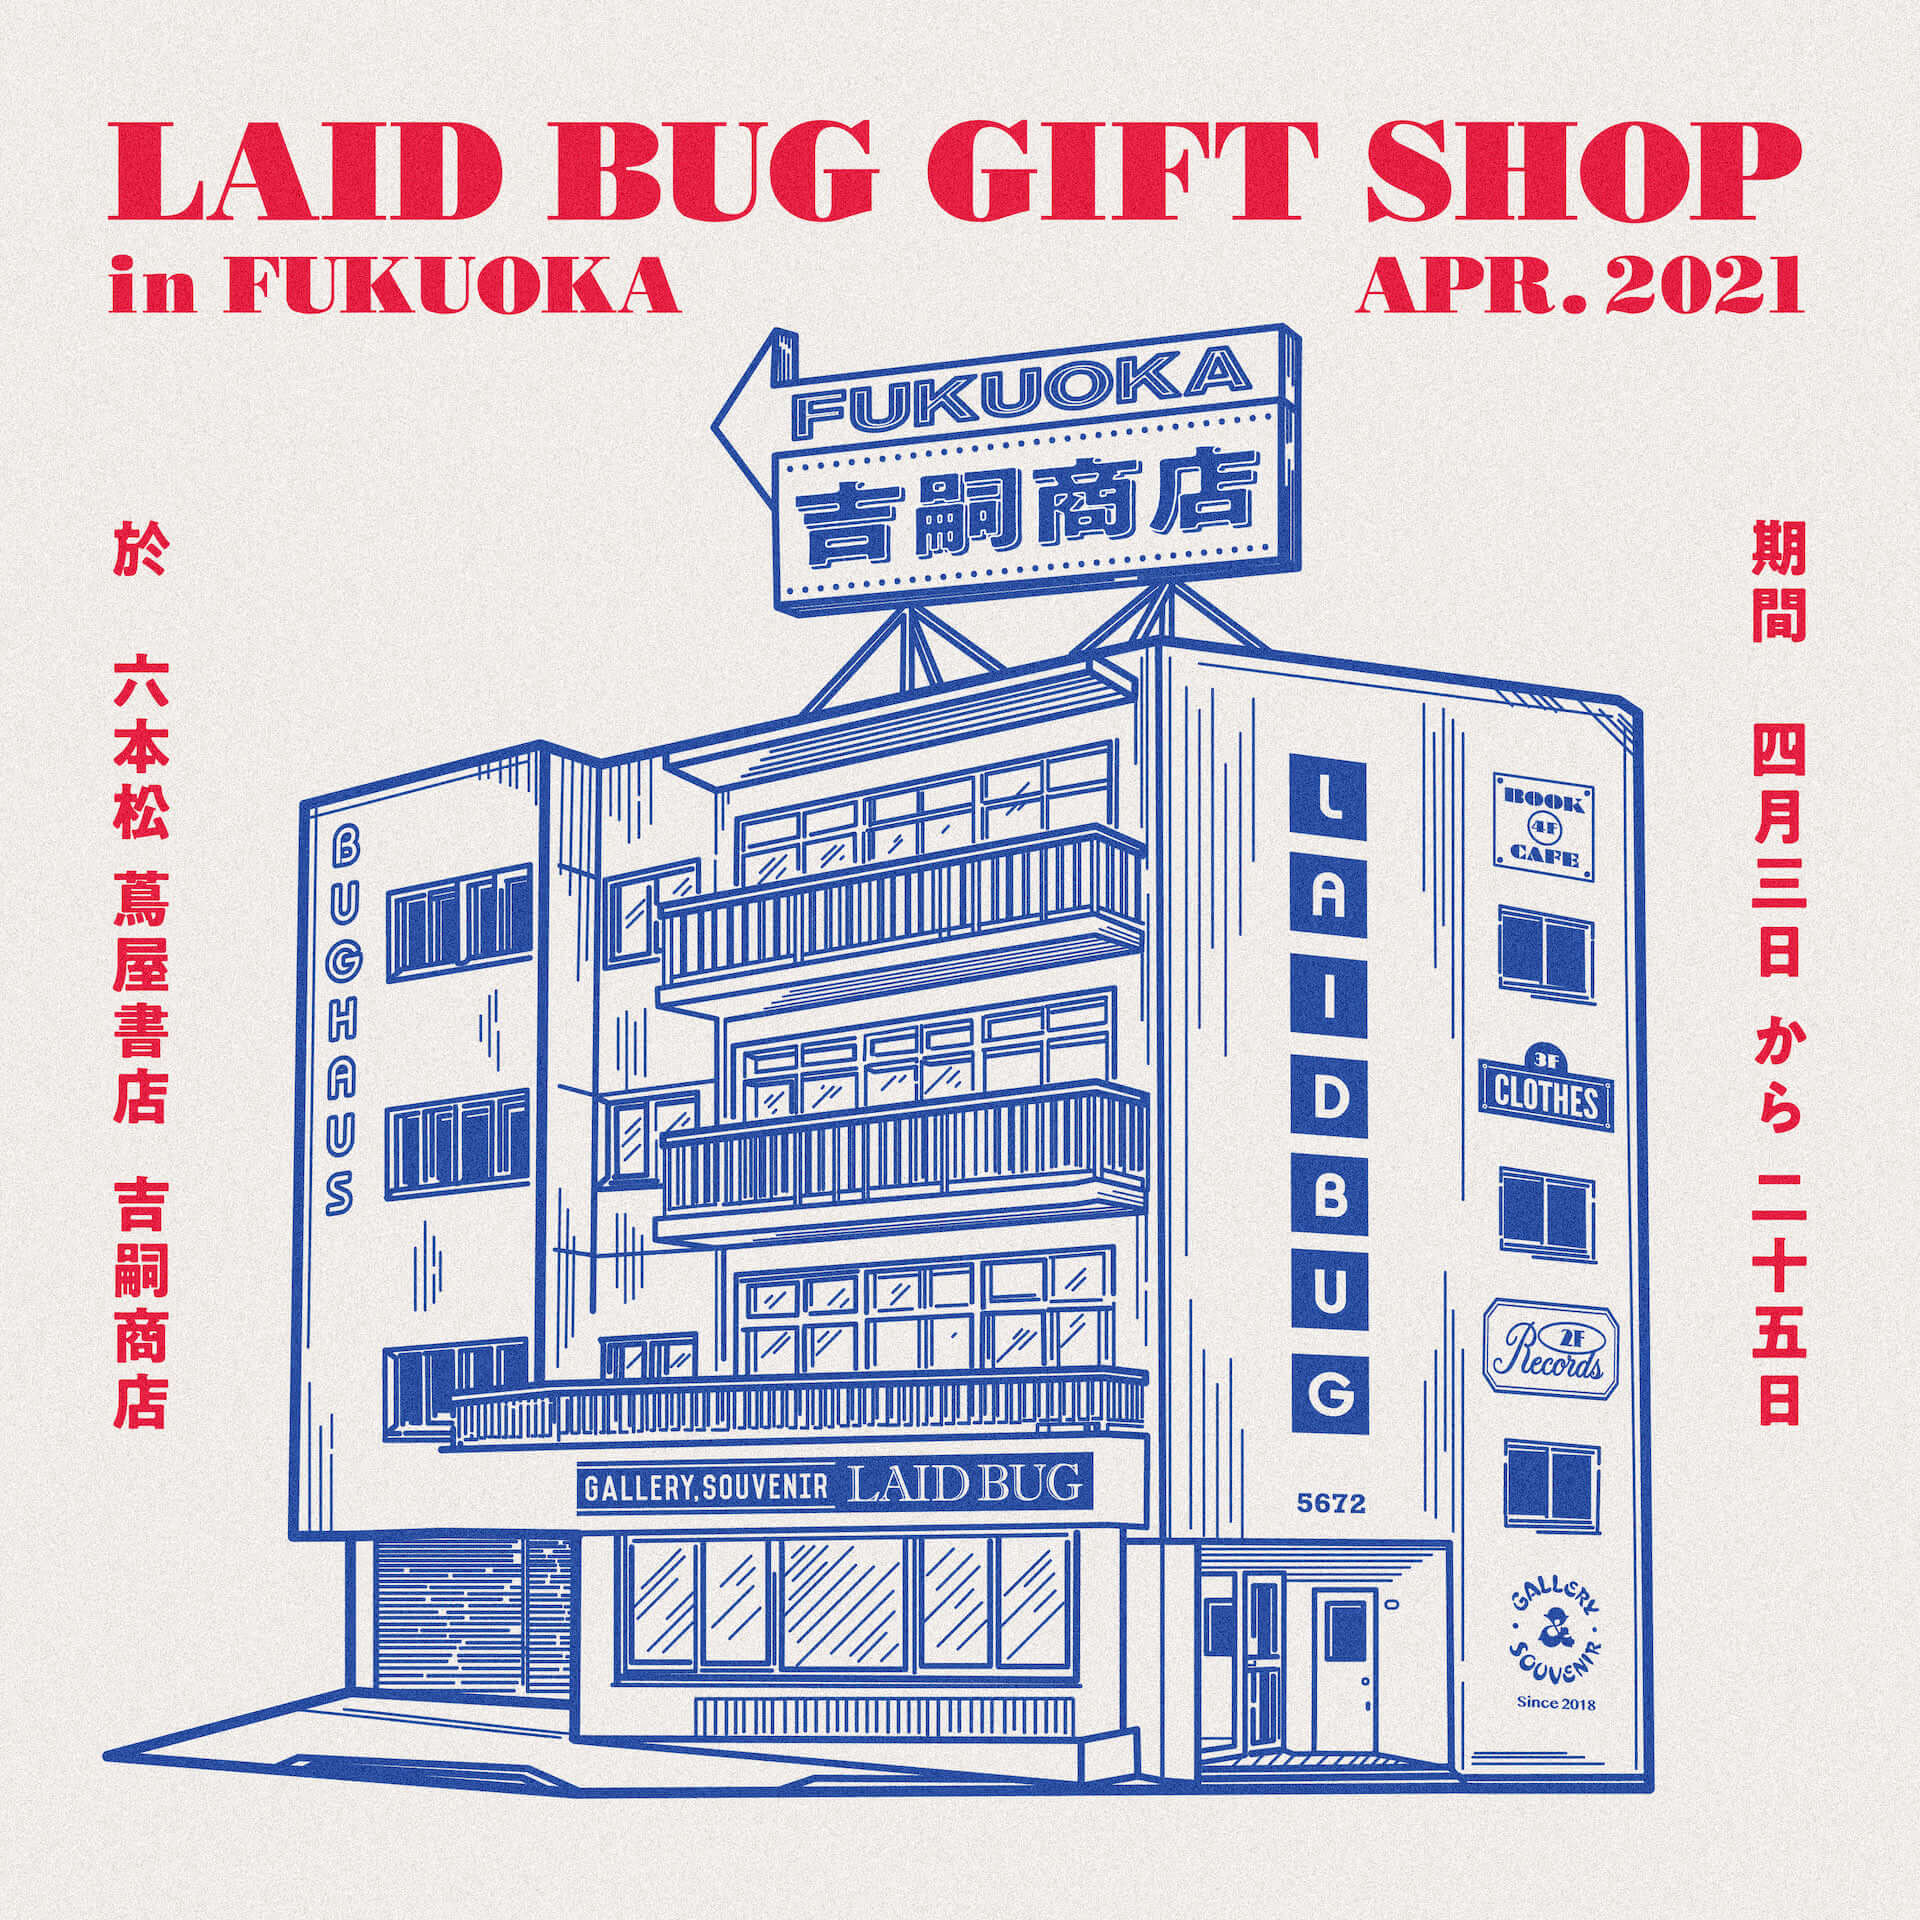 LAID BUGによる期間限定ポップアップショップが福岡の六本松 蔦屋書店「吉嗣商店」にて開催決定! art210330_laidbug_1-1920x1920